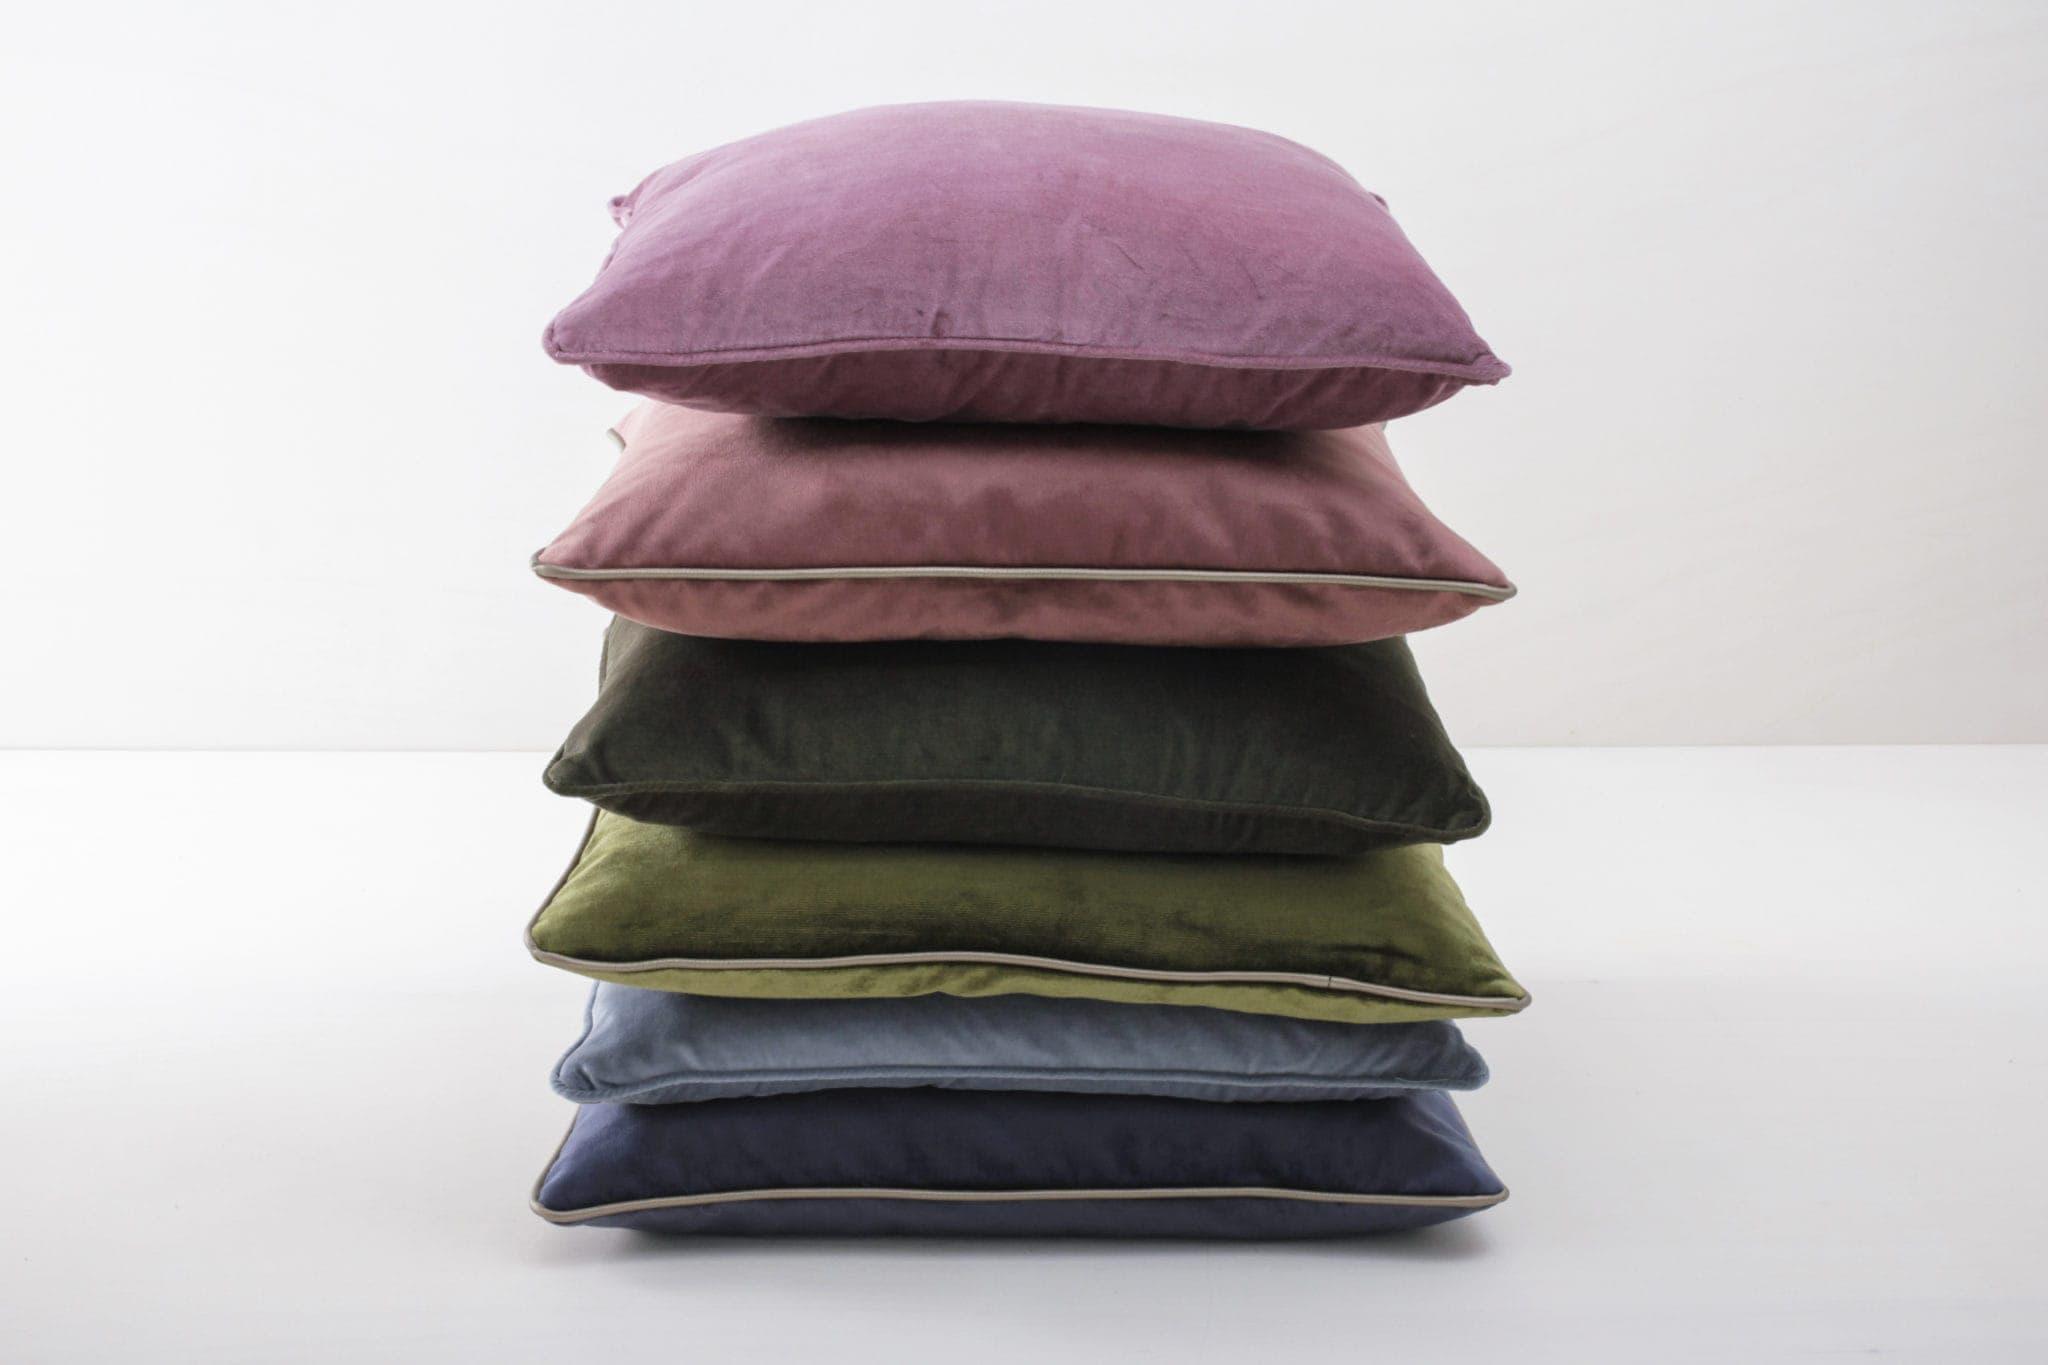 Pillow Marina Velvet Light Blue 50x50 | Soft velvet pillows made from cotton. Several colours to combine such as velvet pillows in blush, dark green and pink. | gotvintage Rental & Event Design